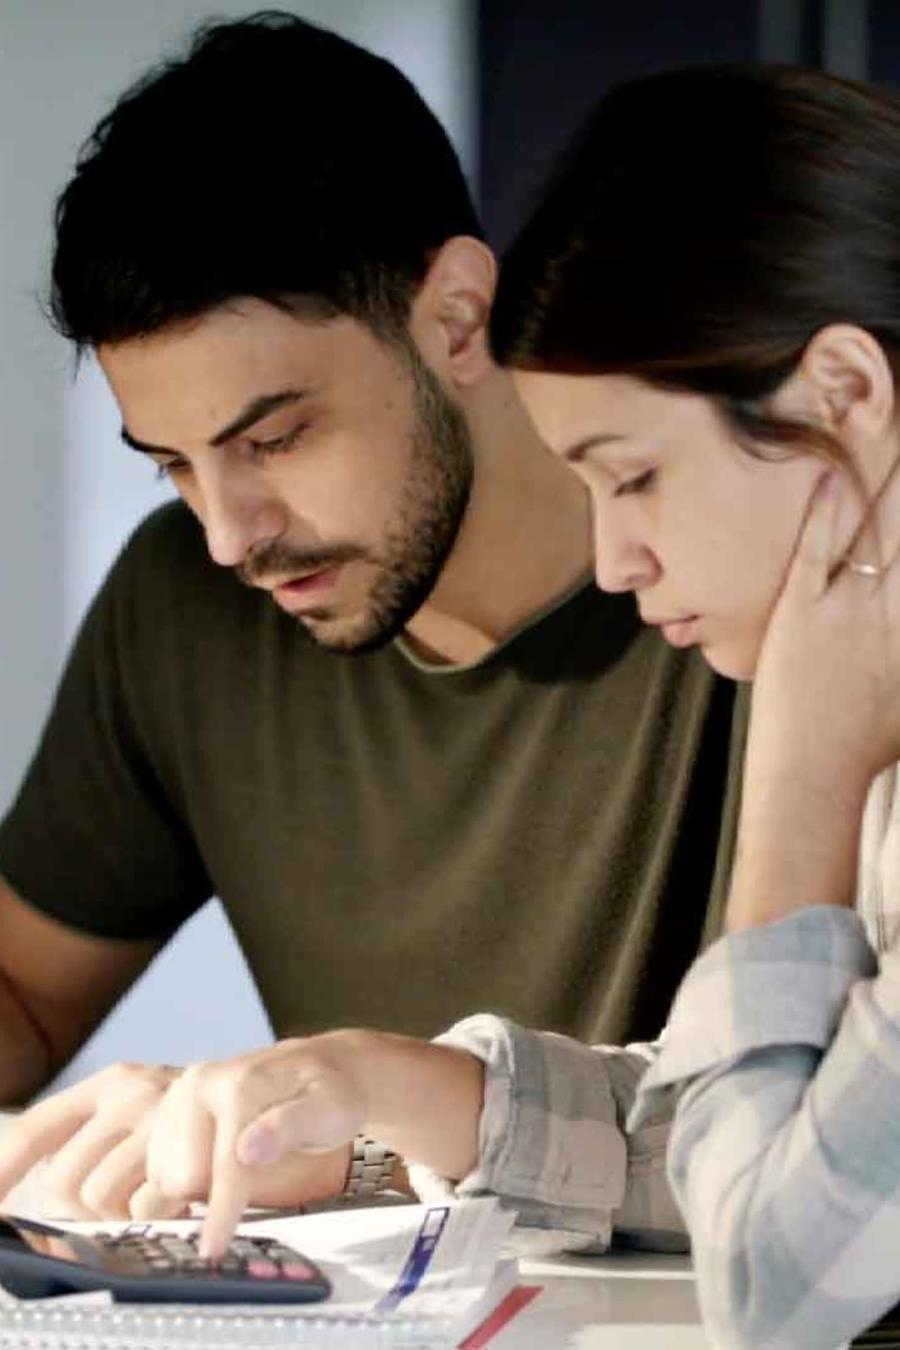 Pareja analiza su plan de 401k